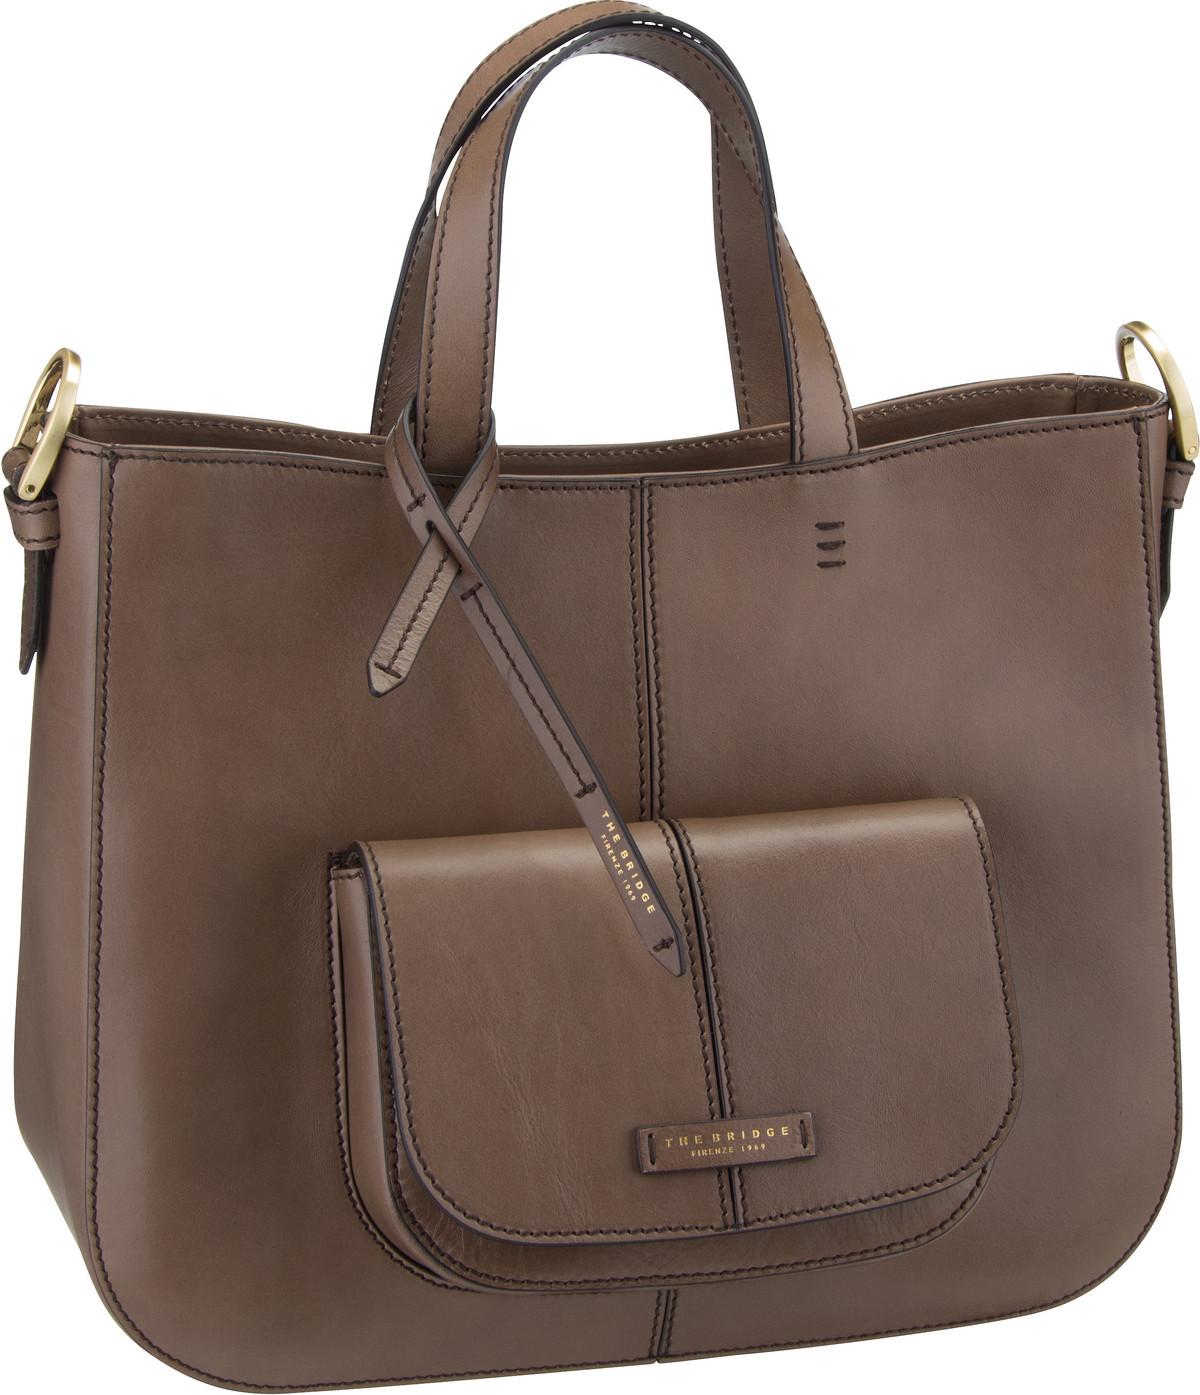 Shopper Faentina Handtasche 4649 Taupe/Oro